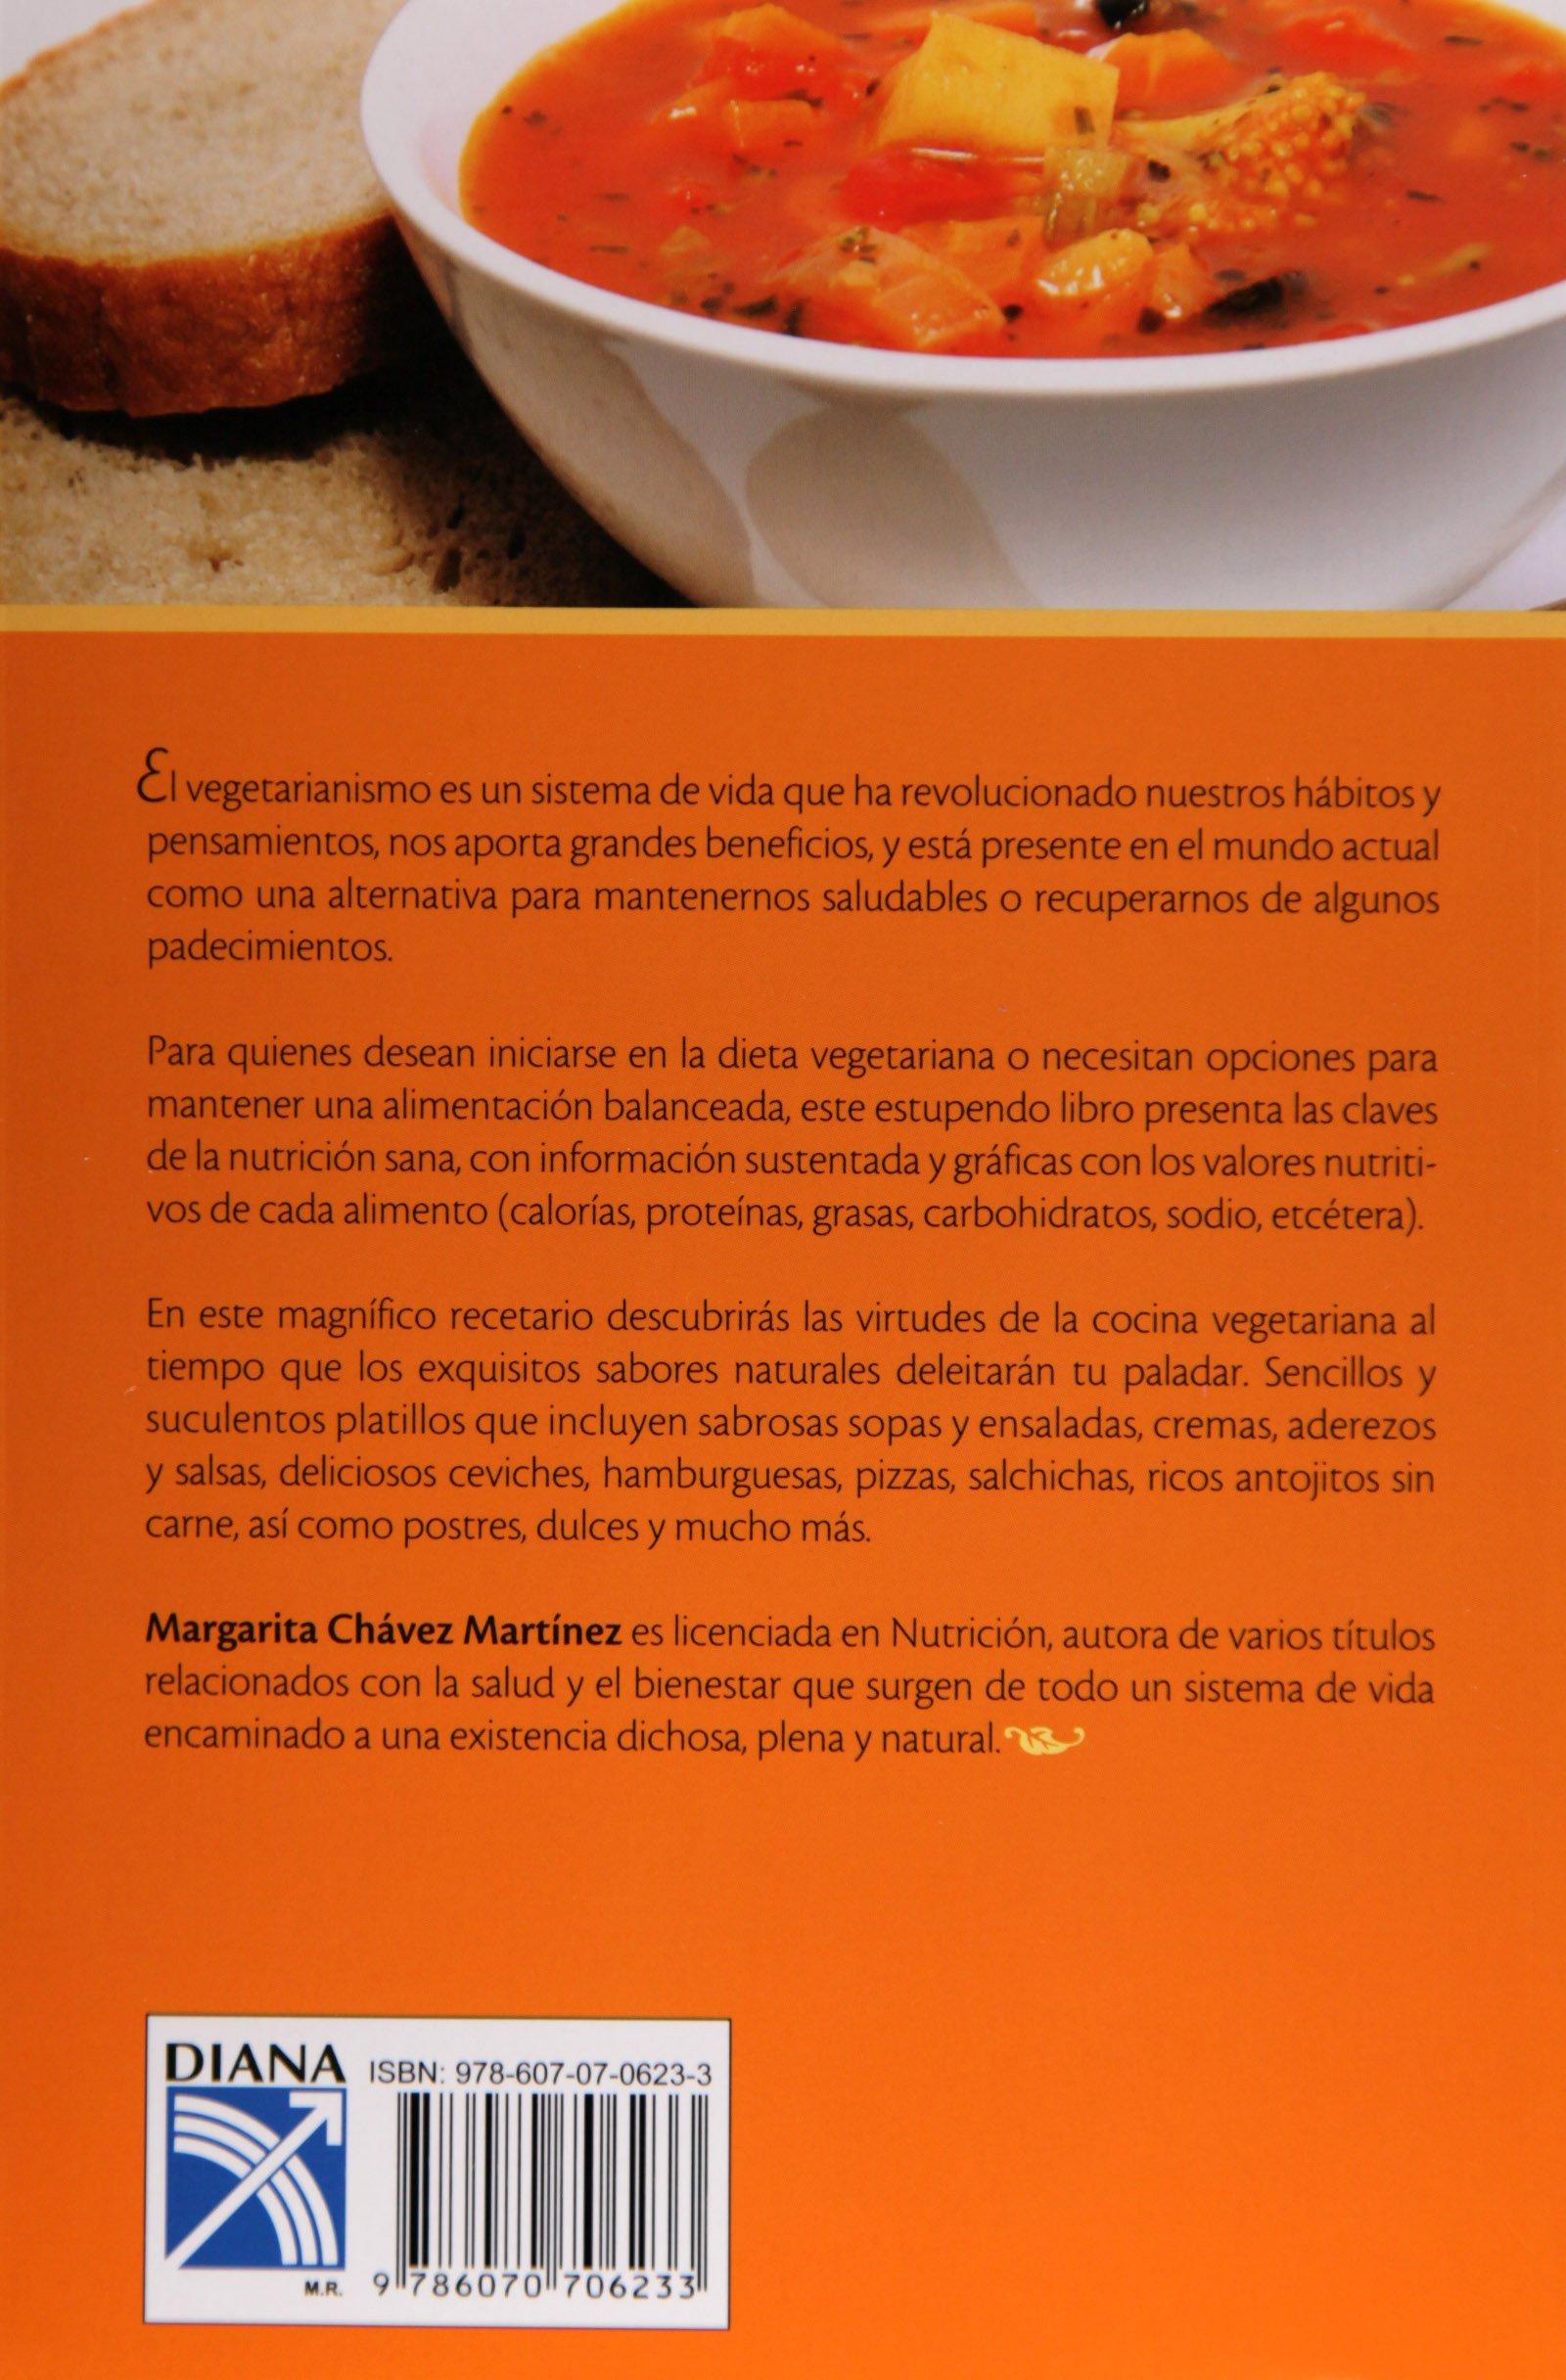 Manual de Nutricion y Comida Vegetariana (Spanish Edition): Margarita Chavez Martinez: 9786070706233: Amazon.com: Books